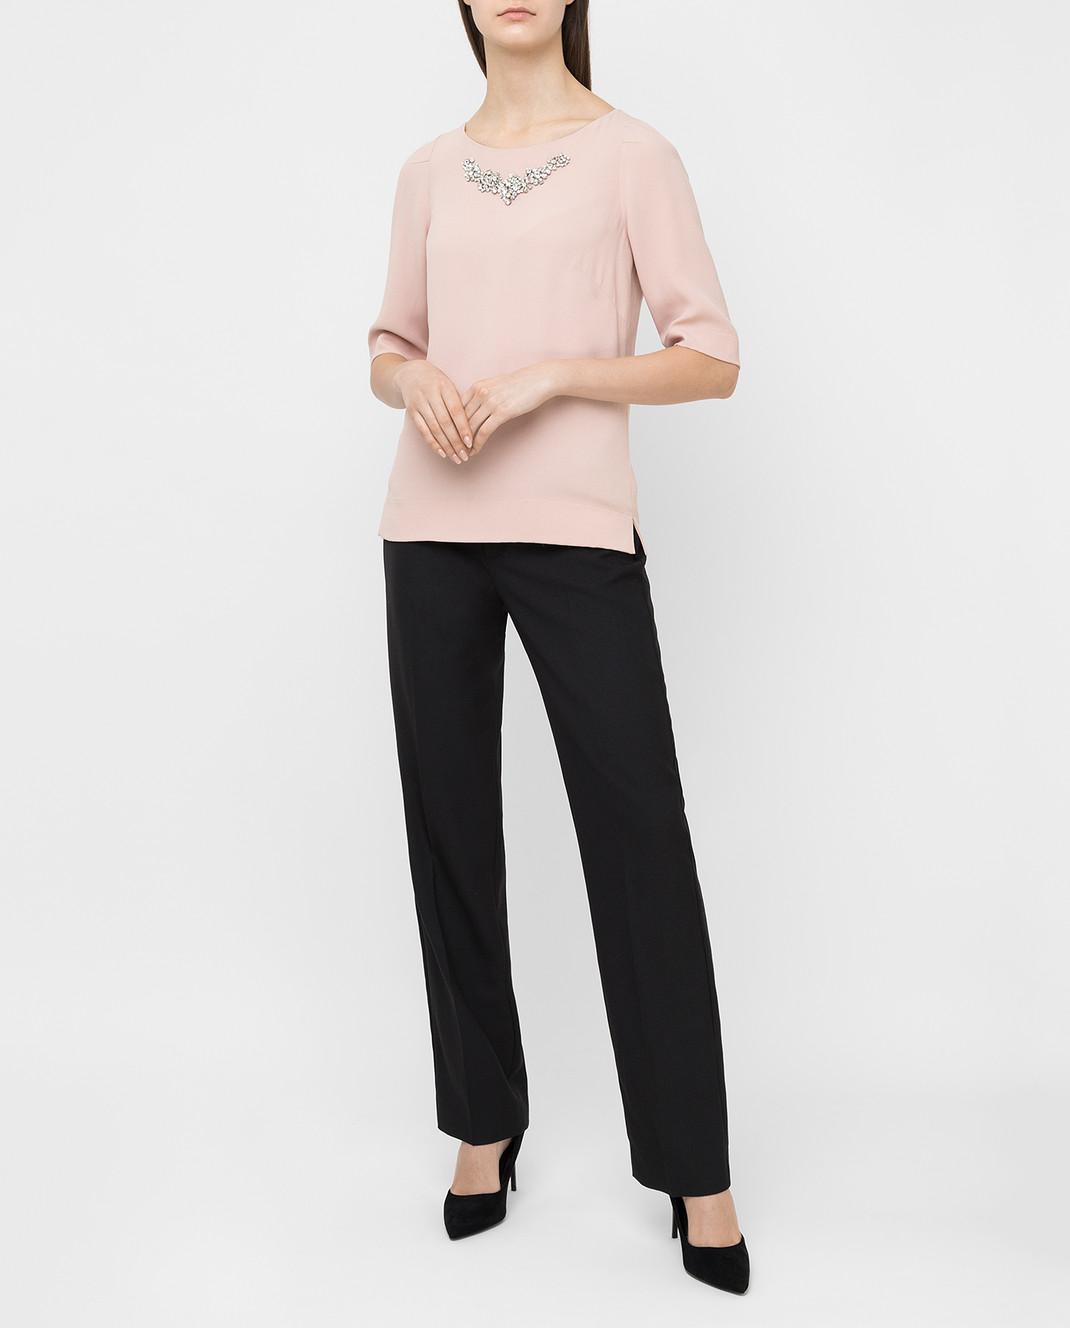 Jenny Packham Пудровая блуза с кристаллами WT104 изображение 2